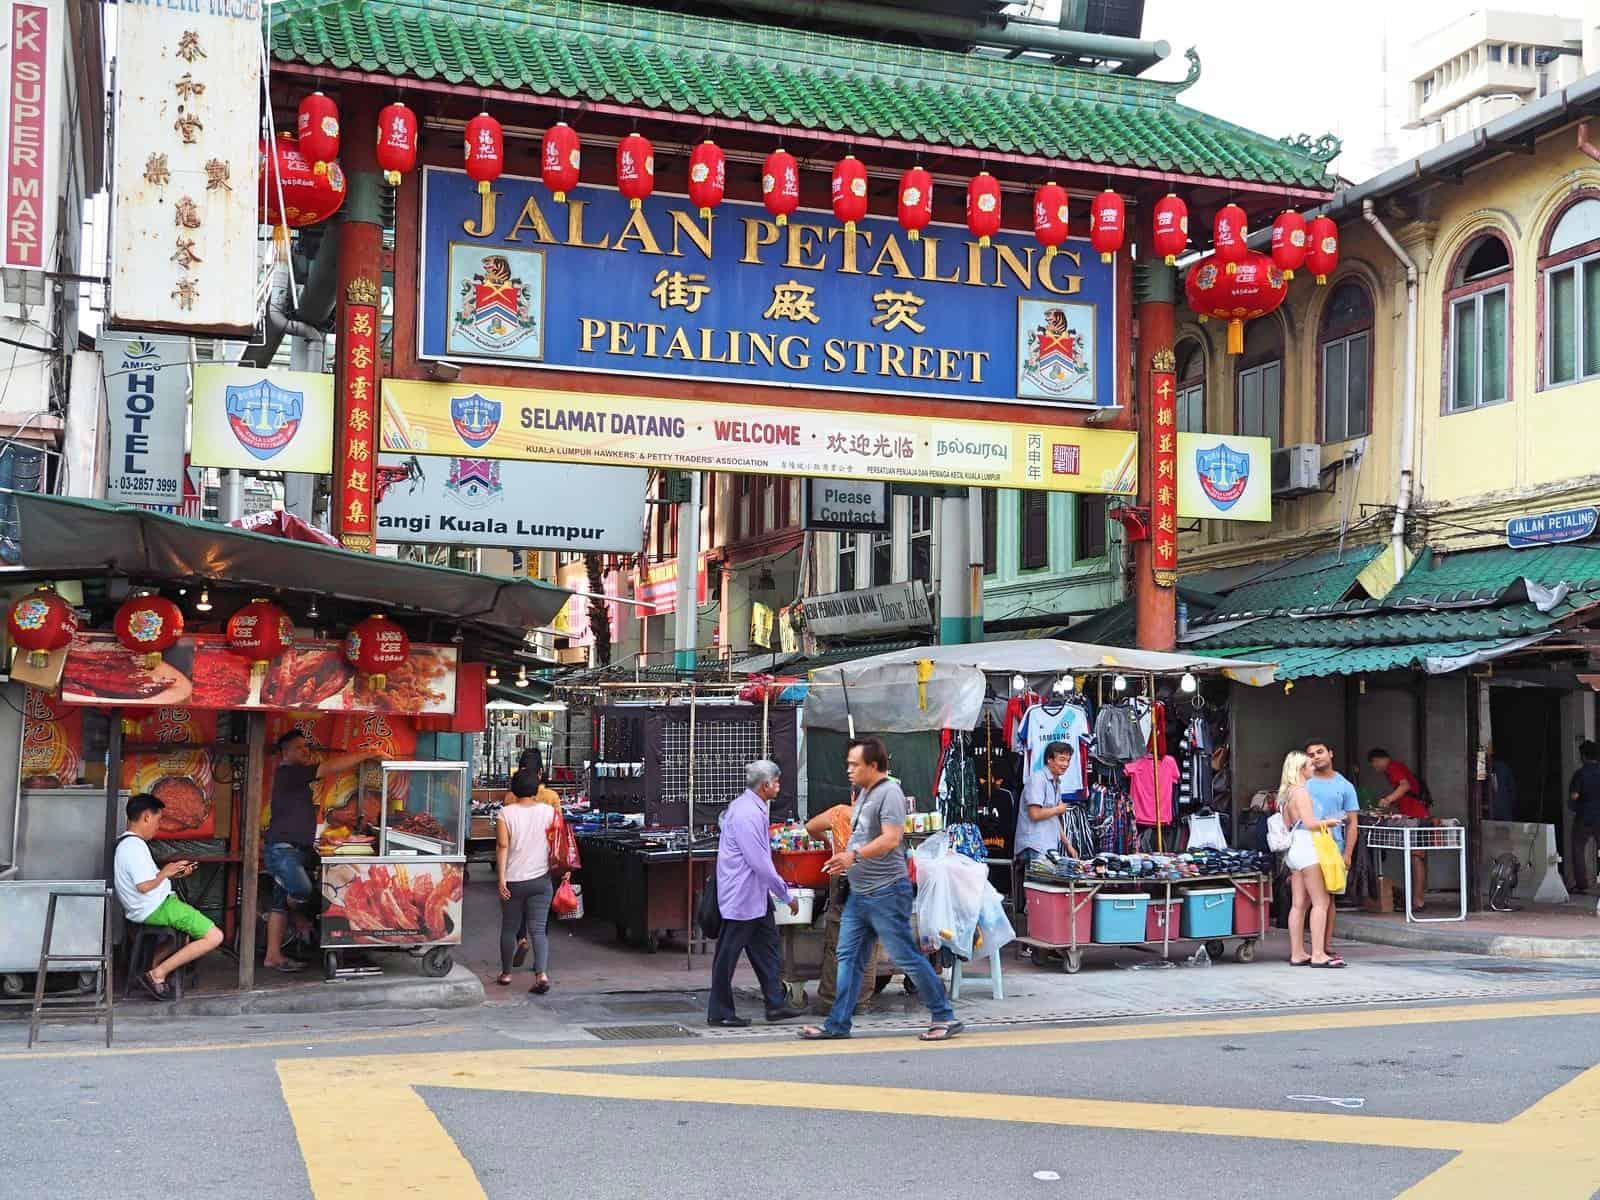 Petaling Street in Chinatown, Kuala-Lumpur